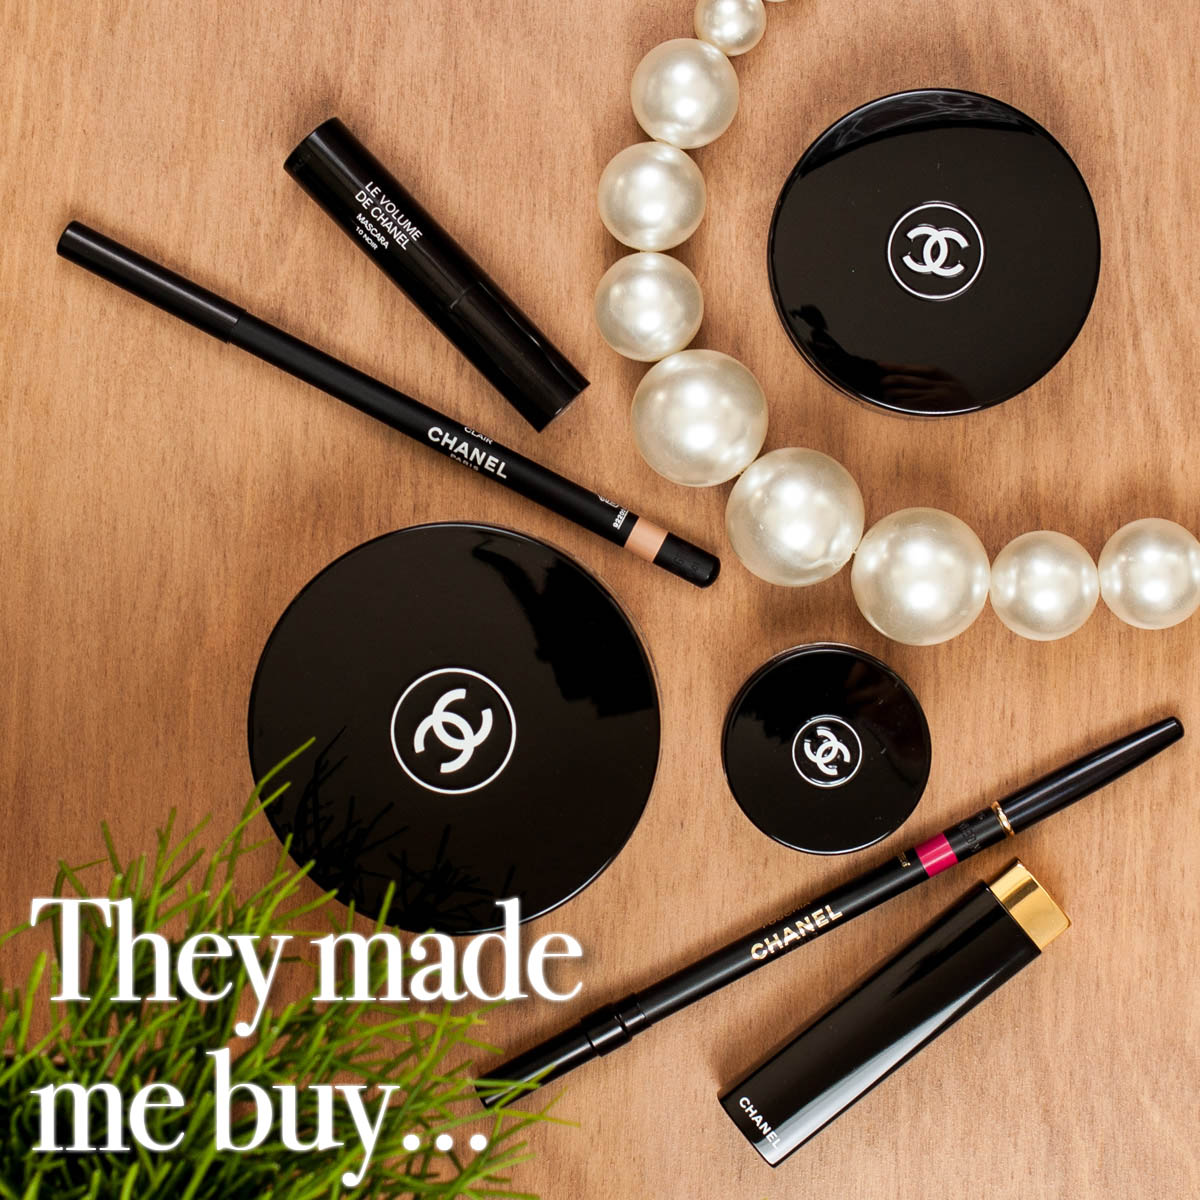 CHANEL Beauty Makeup LExuberante Velvet Fuschia Epatant Clair-7